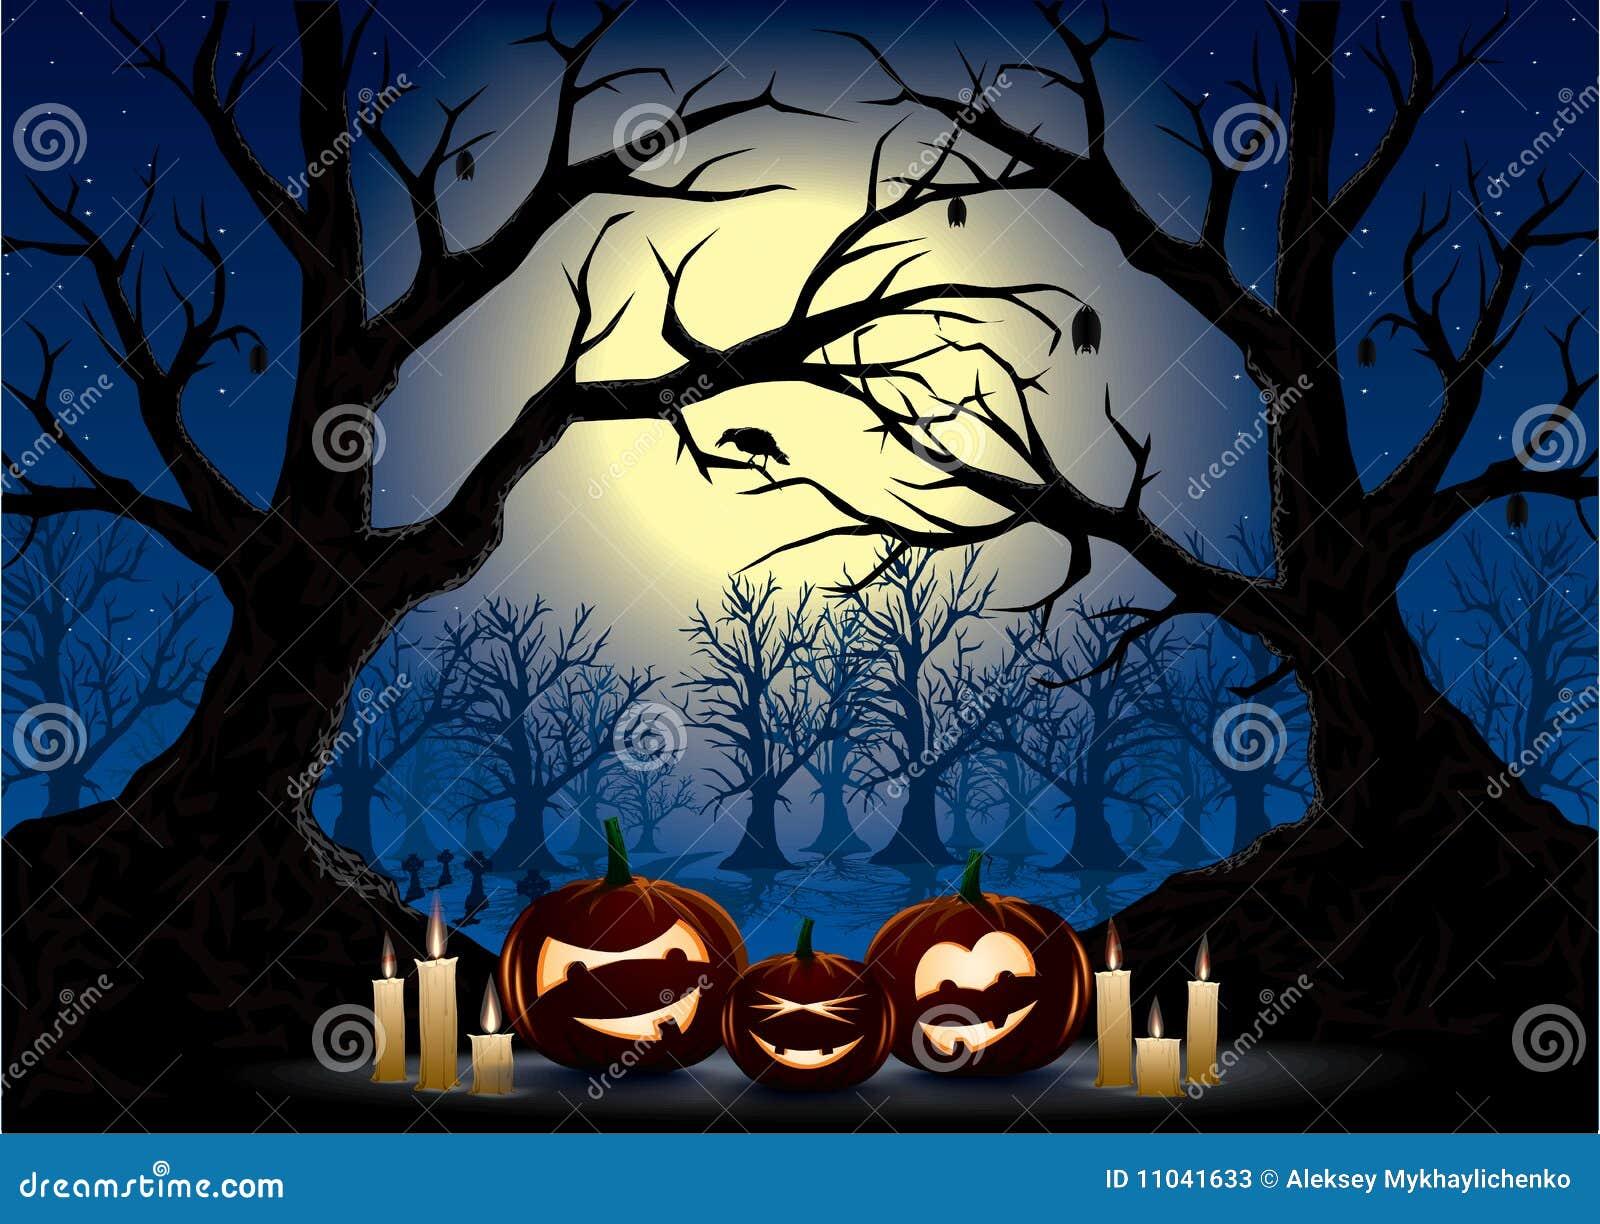 Halloween night stock vector. Image of bleak, cemetary - 11041633